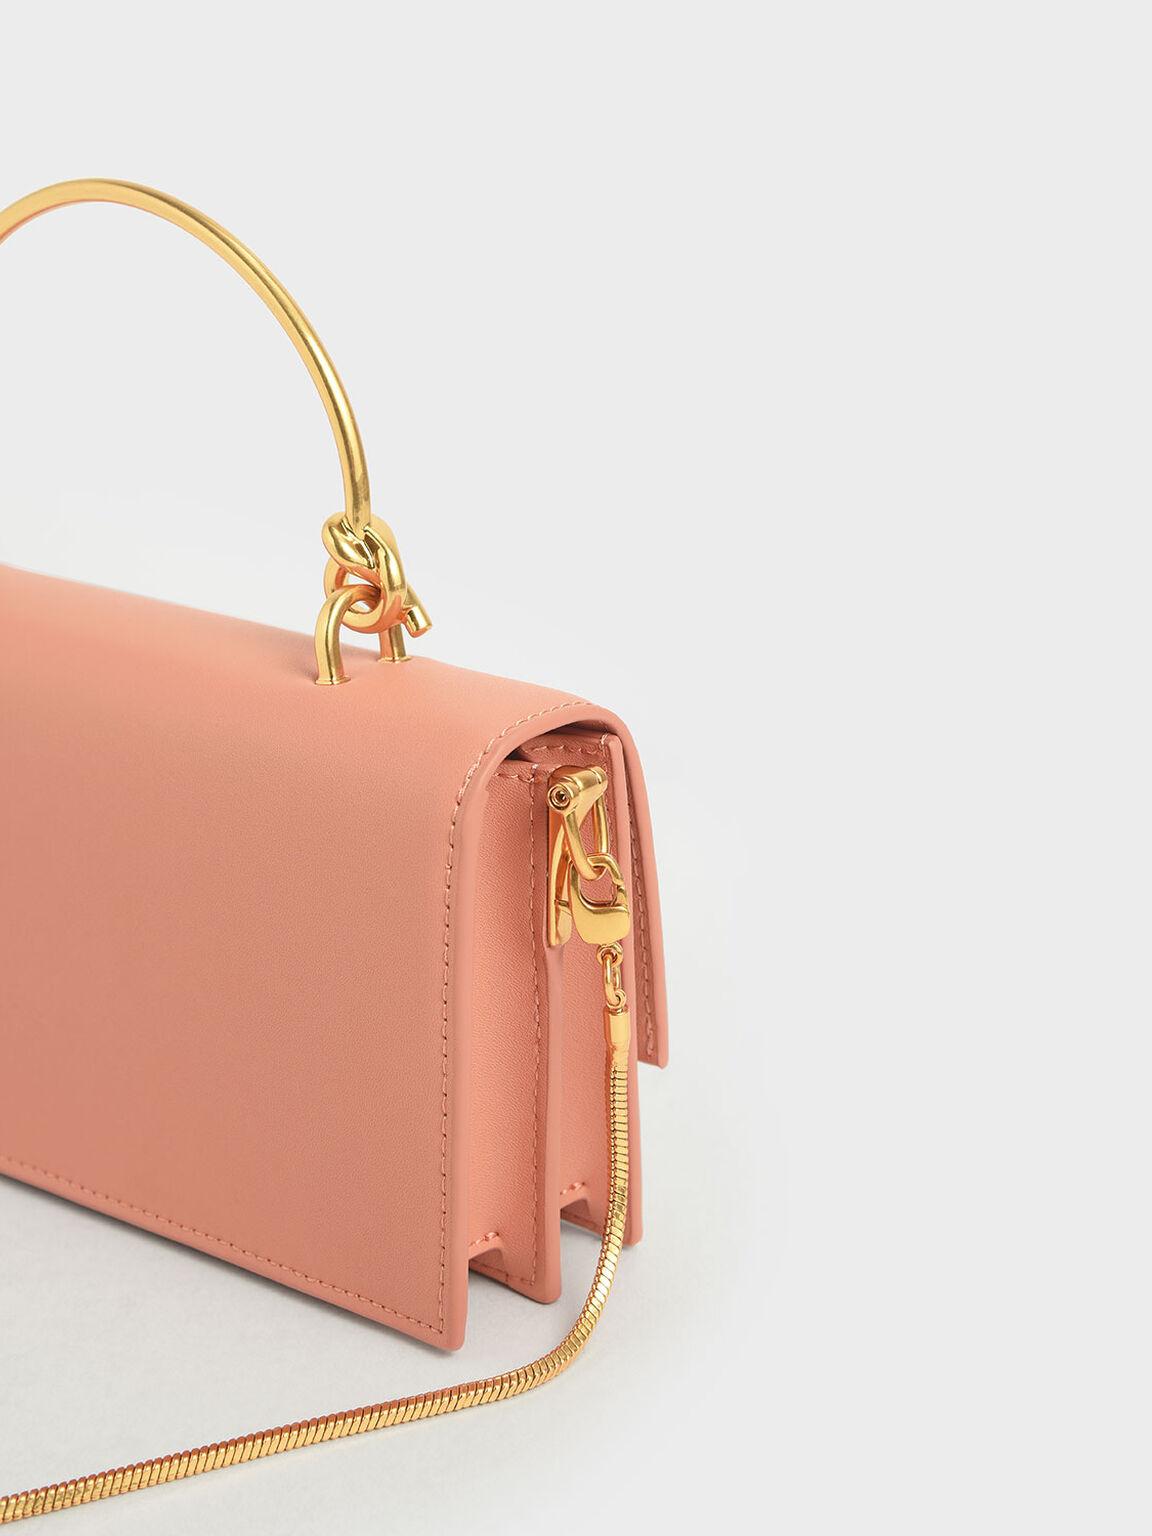 Metal Top Handle Long Wallet, Peach, hi-res